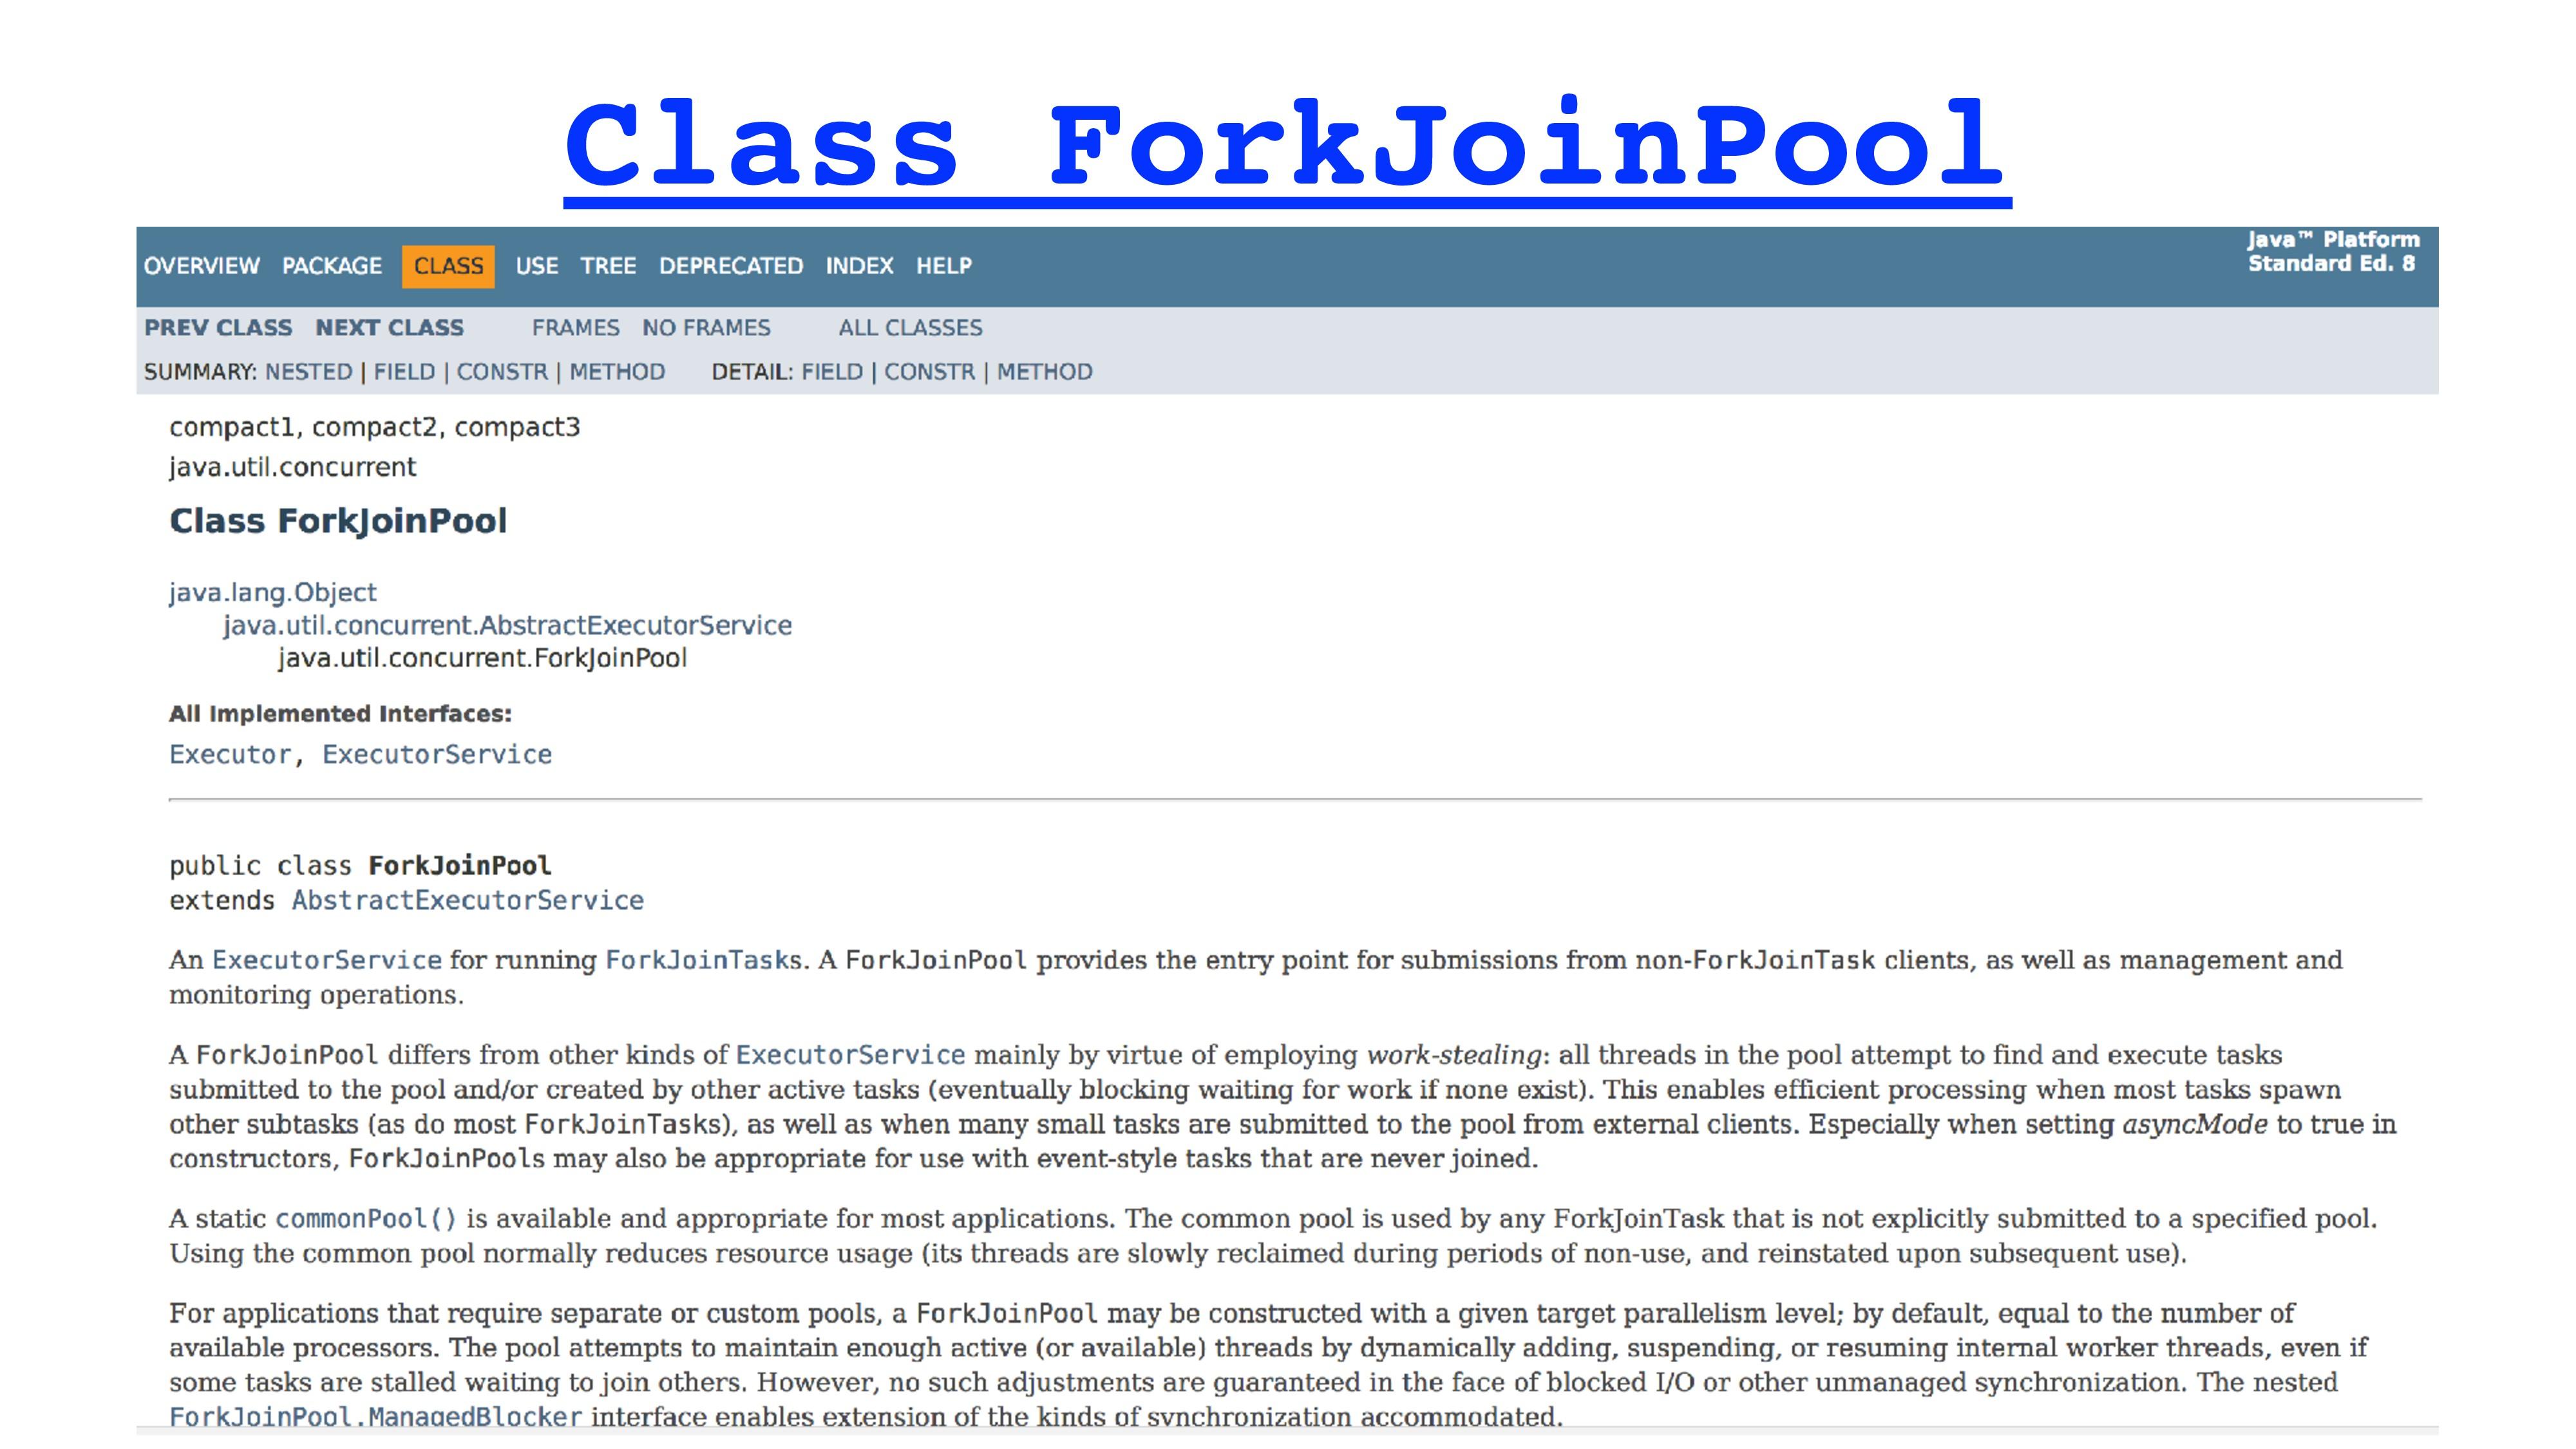 Class ForkJoinPool